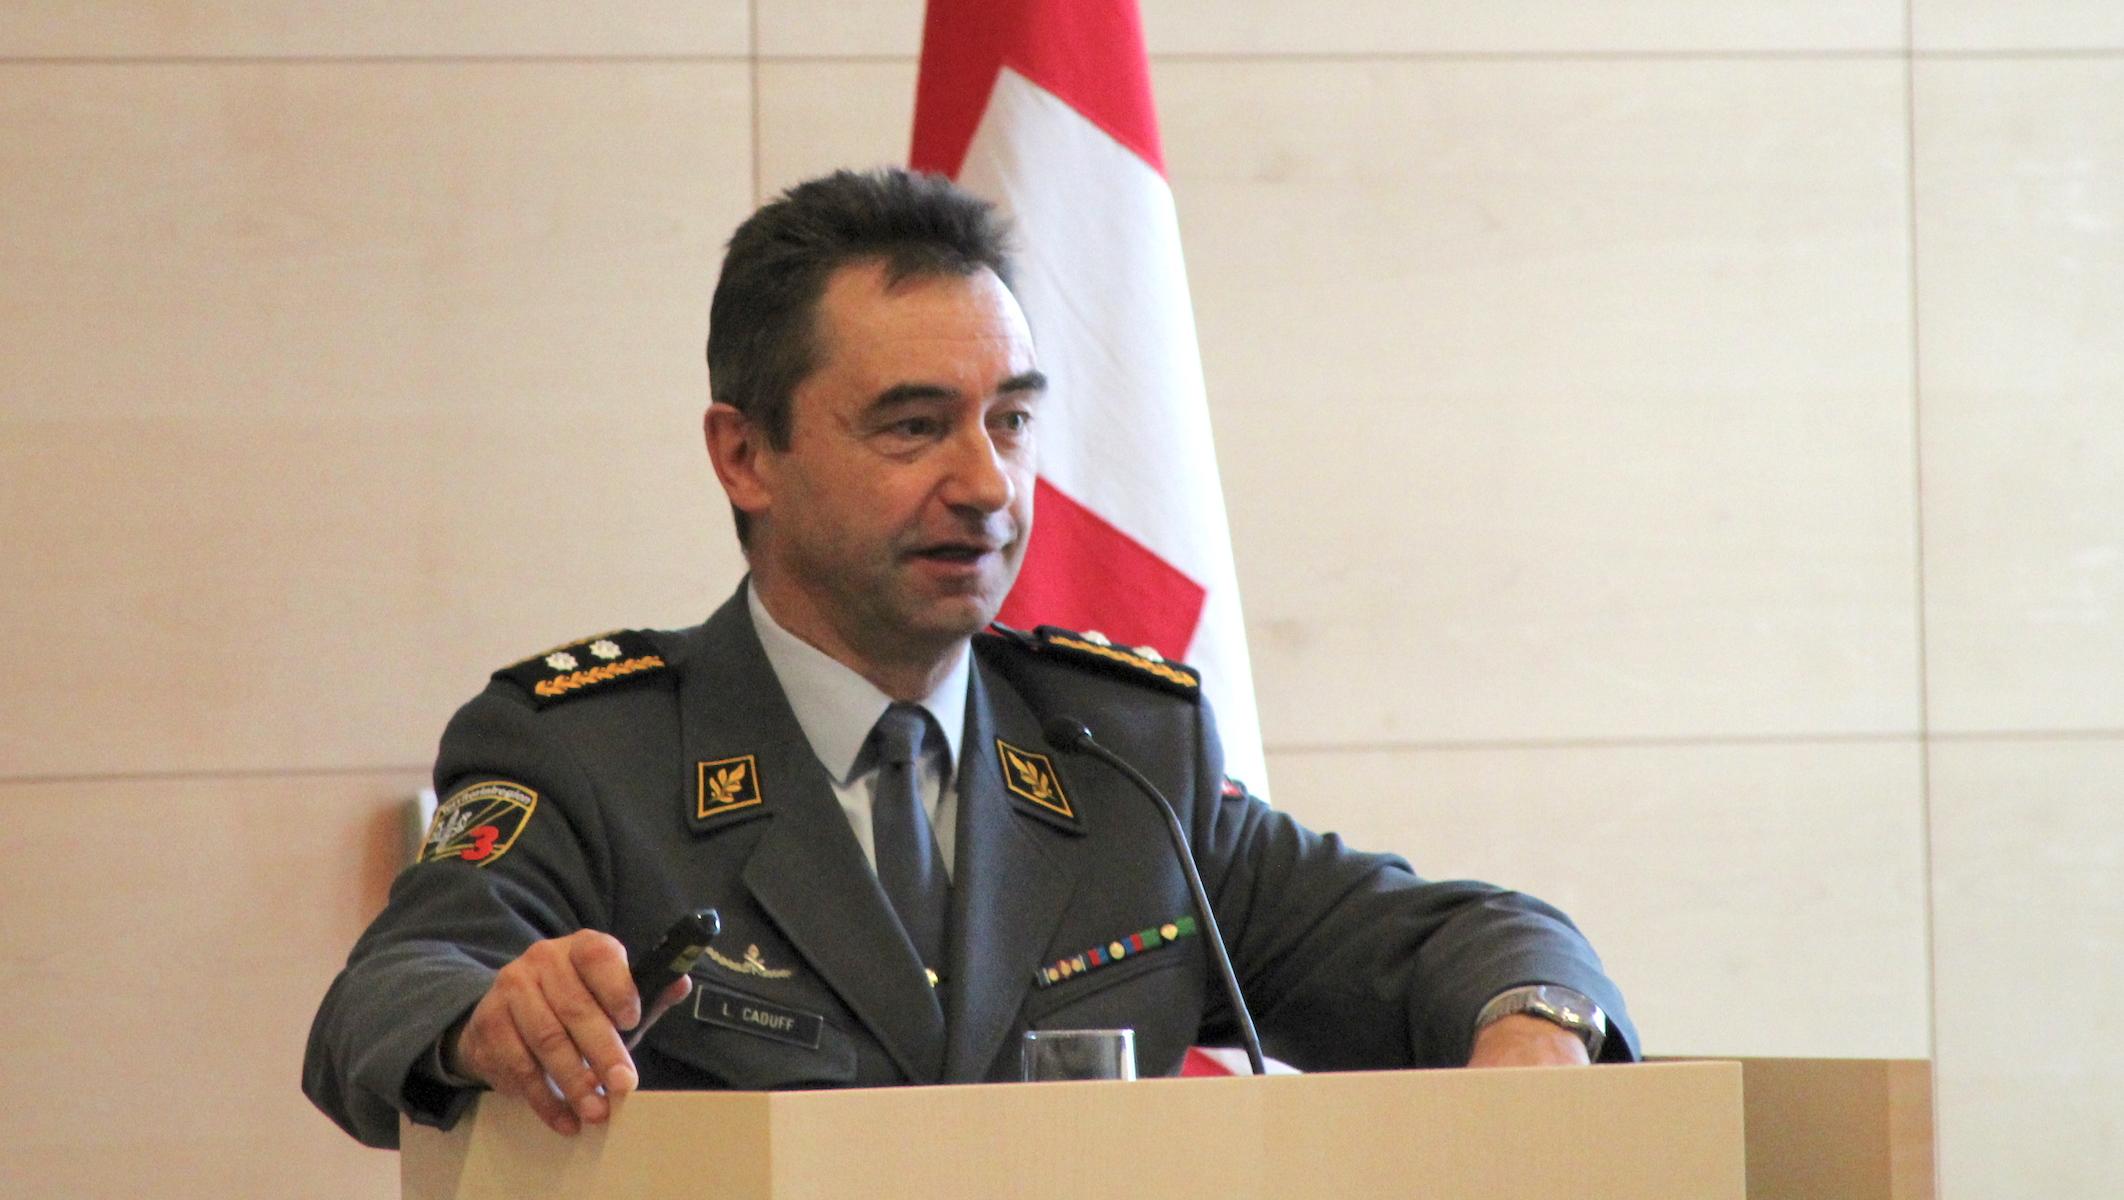 Divisonär Lucas Caduff, Kommandant der Territorialregion 3.